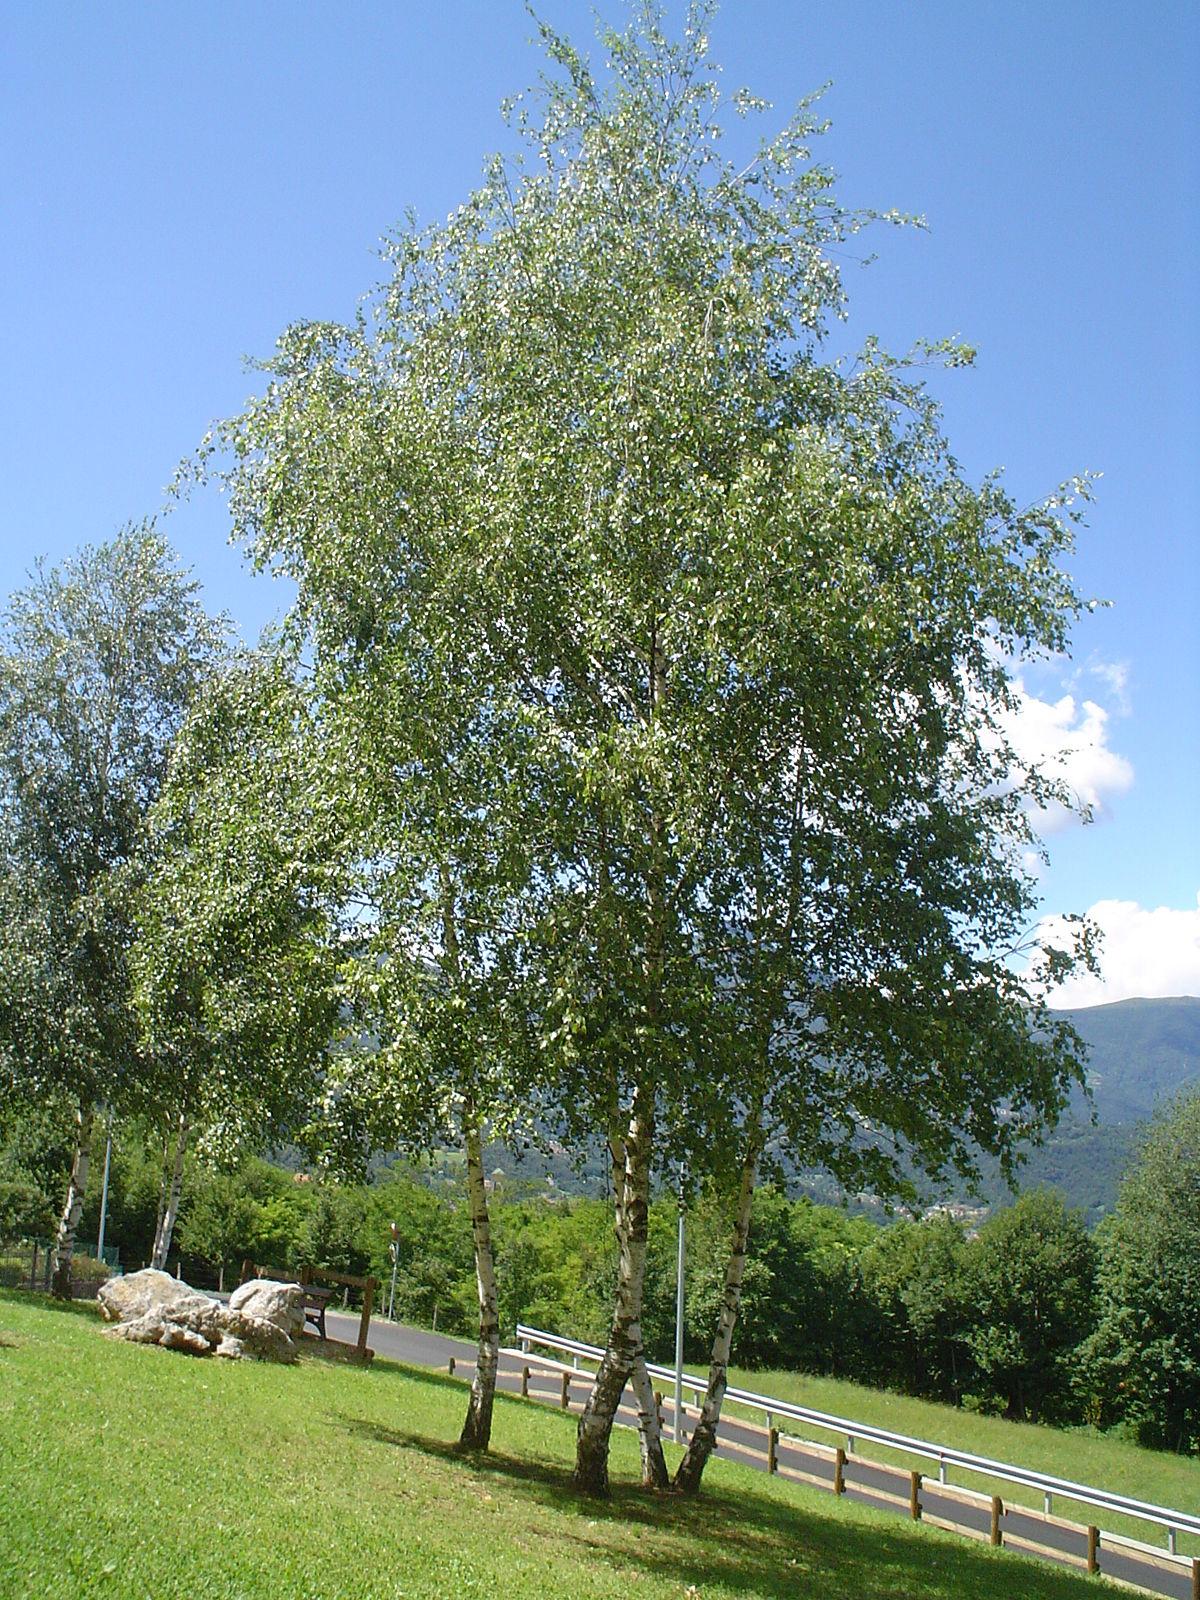 Immagini di alberi betulla